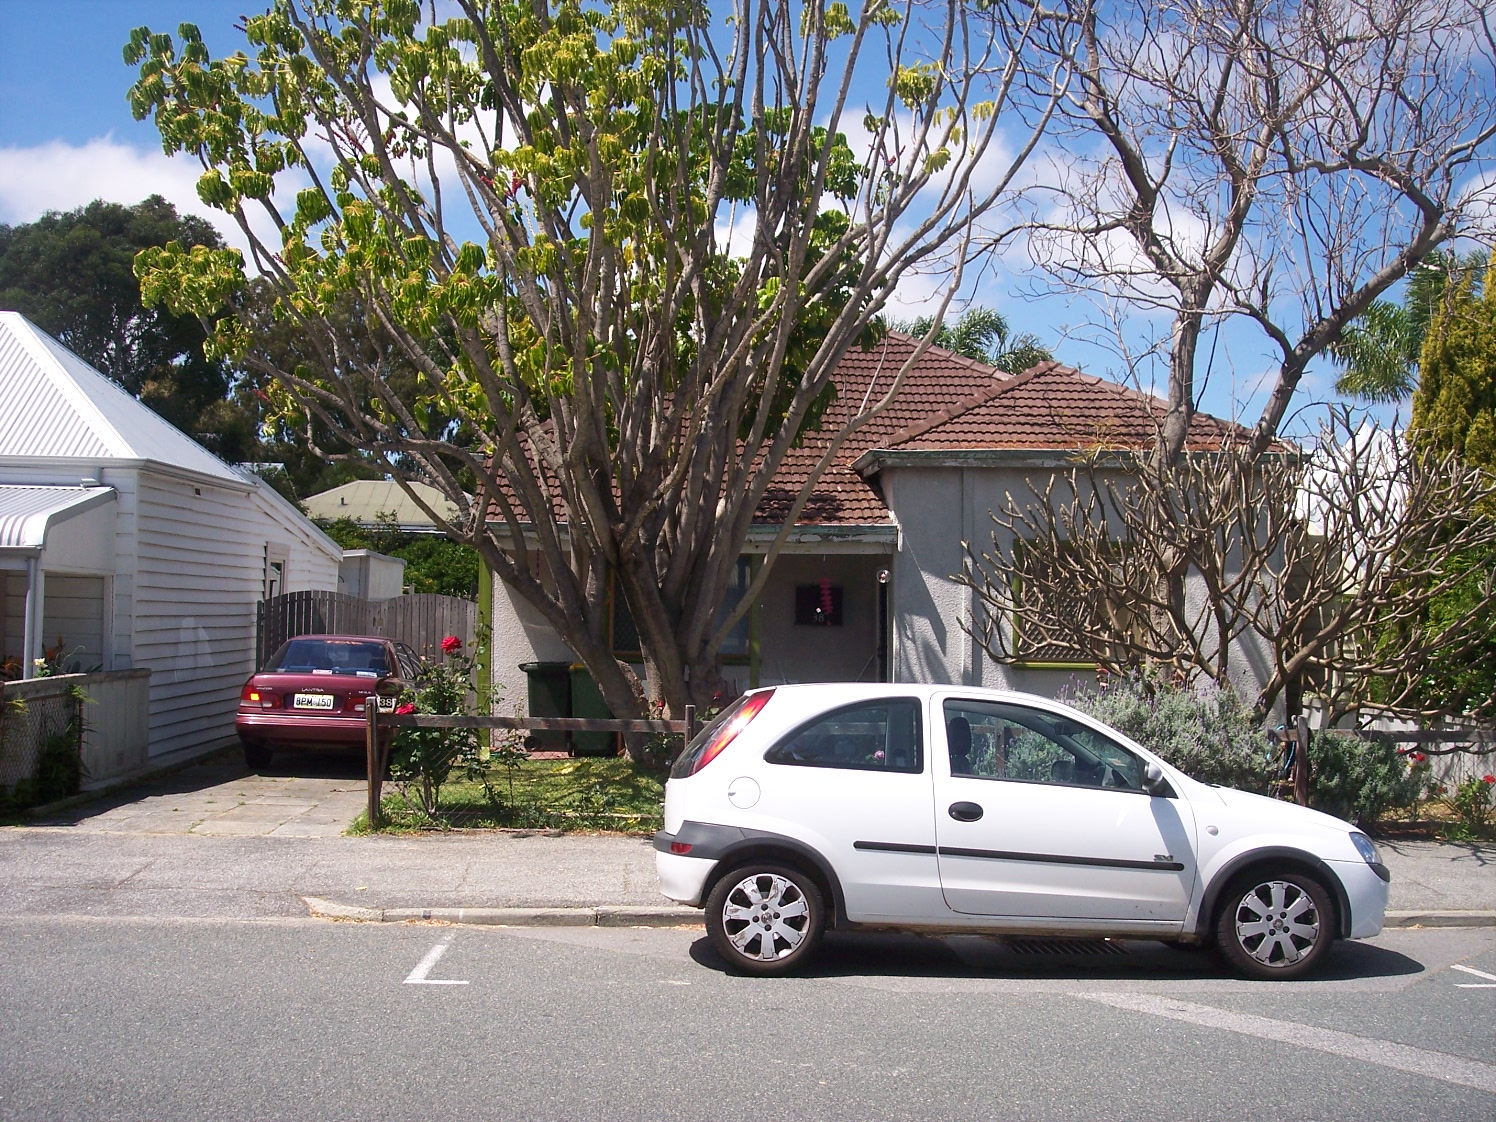 10-10-06 View E 38 Hubble Street.jpg